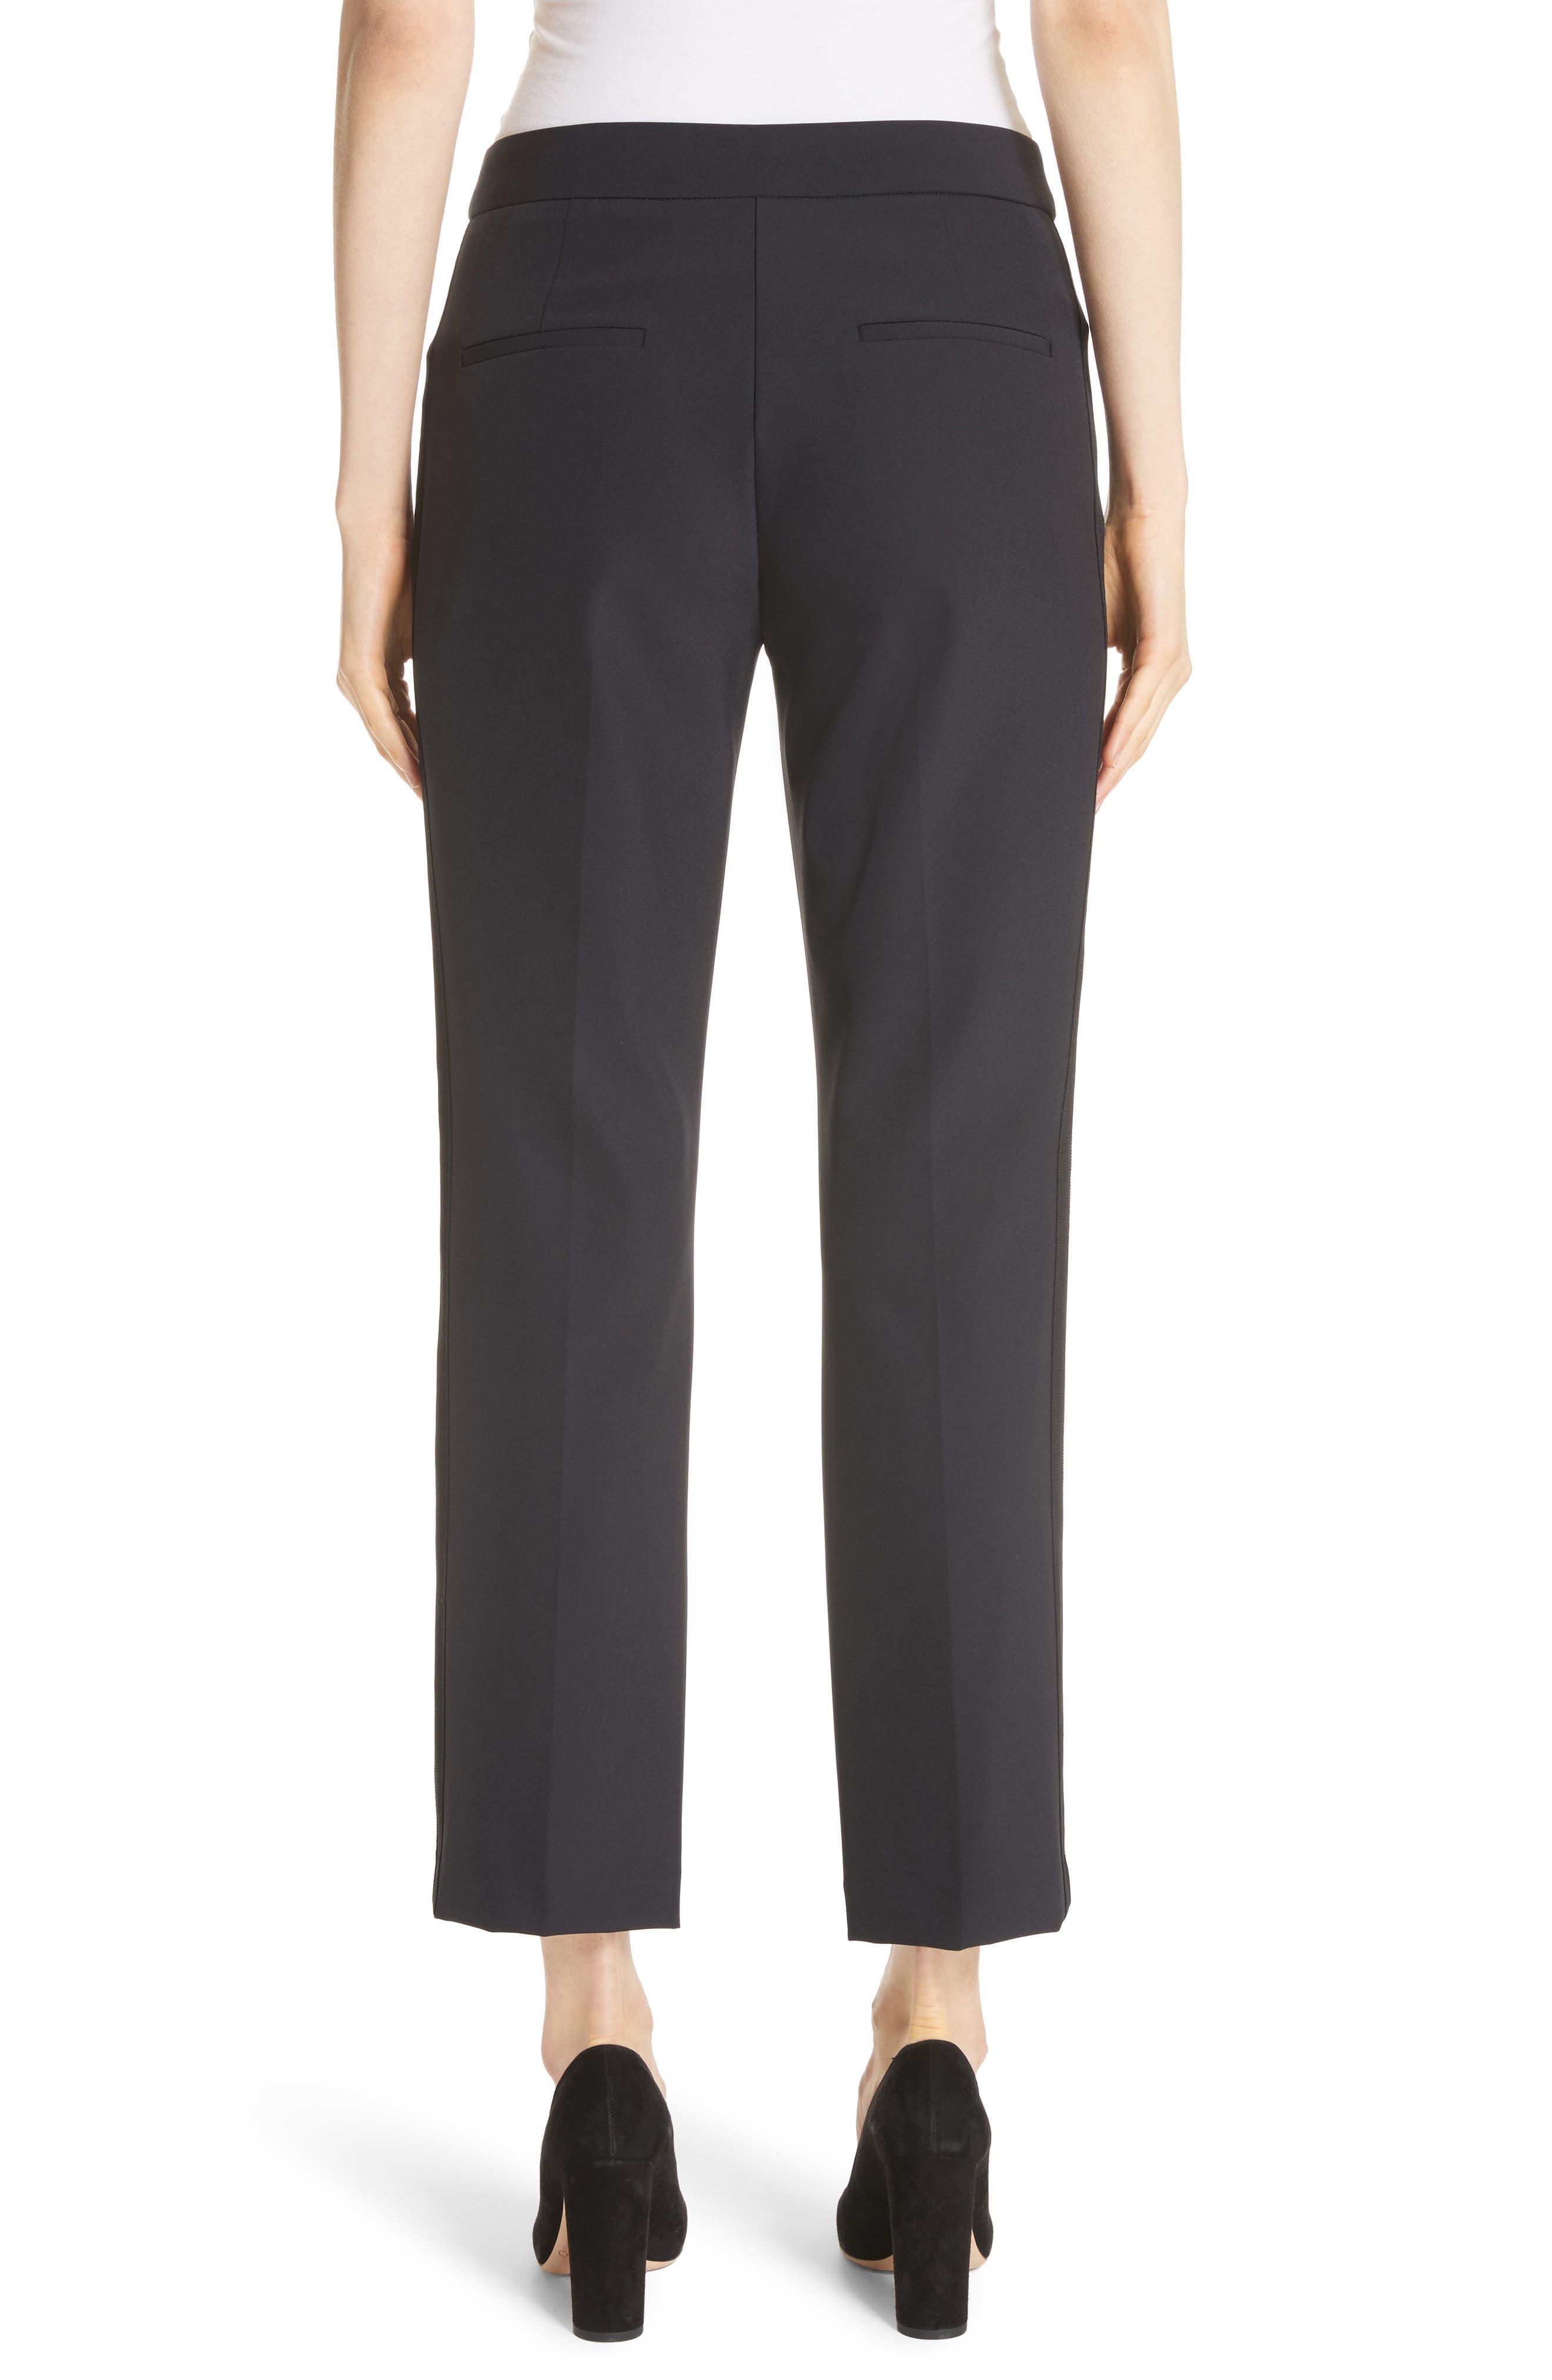 REBECCA TAYLOR, Audra Crop Pants, Alternate thumbnail 2, color, BLACK